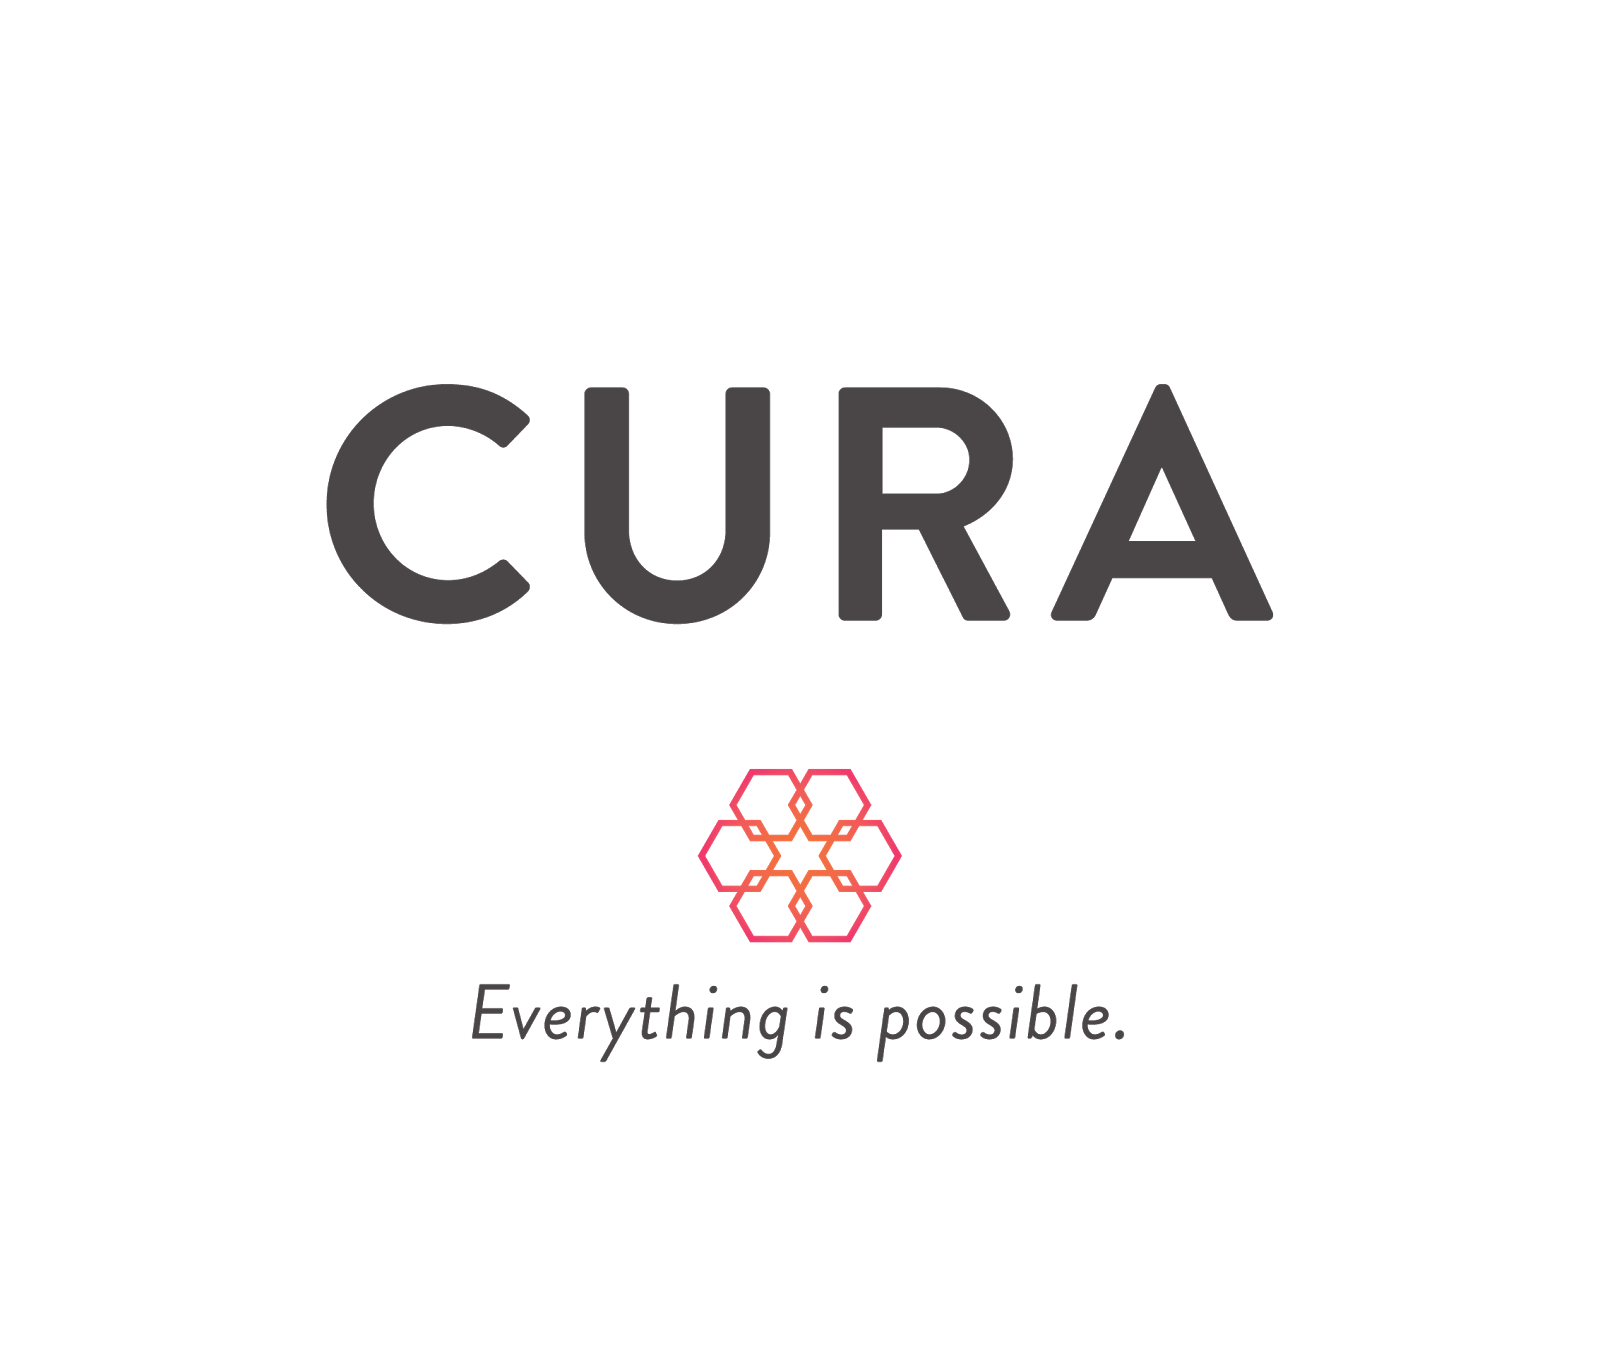 brand ambassador job in eureka cura cs